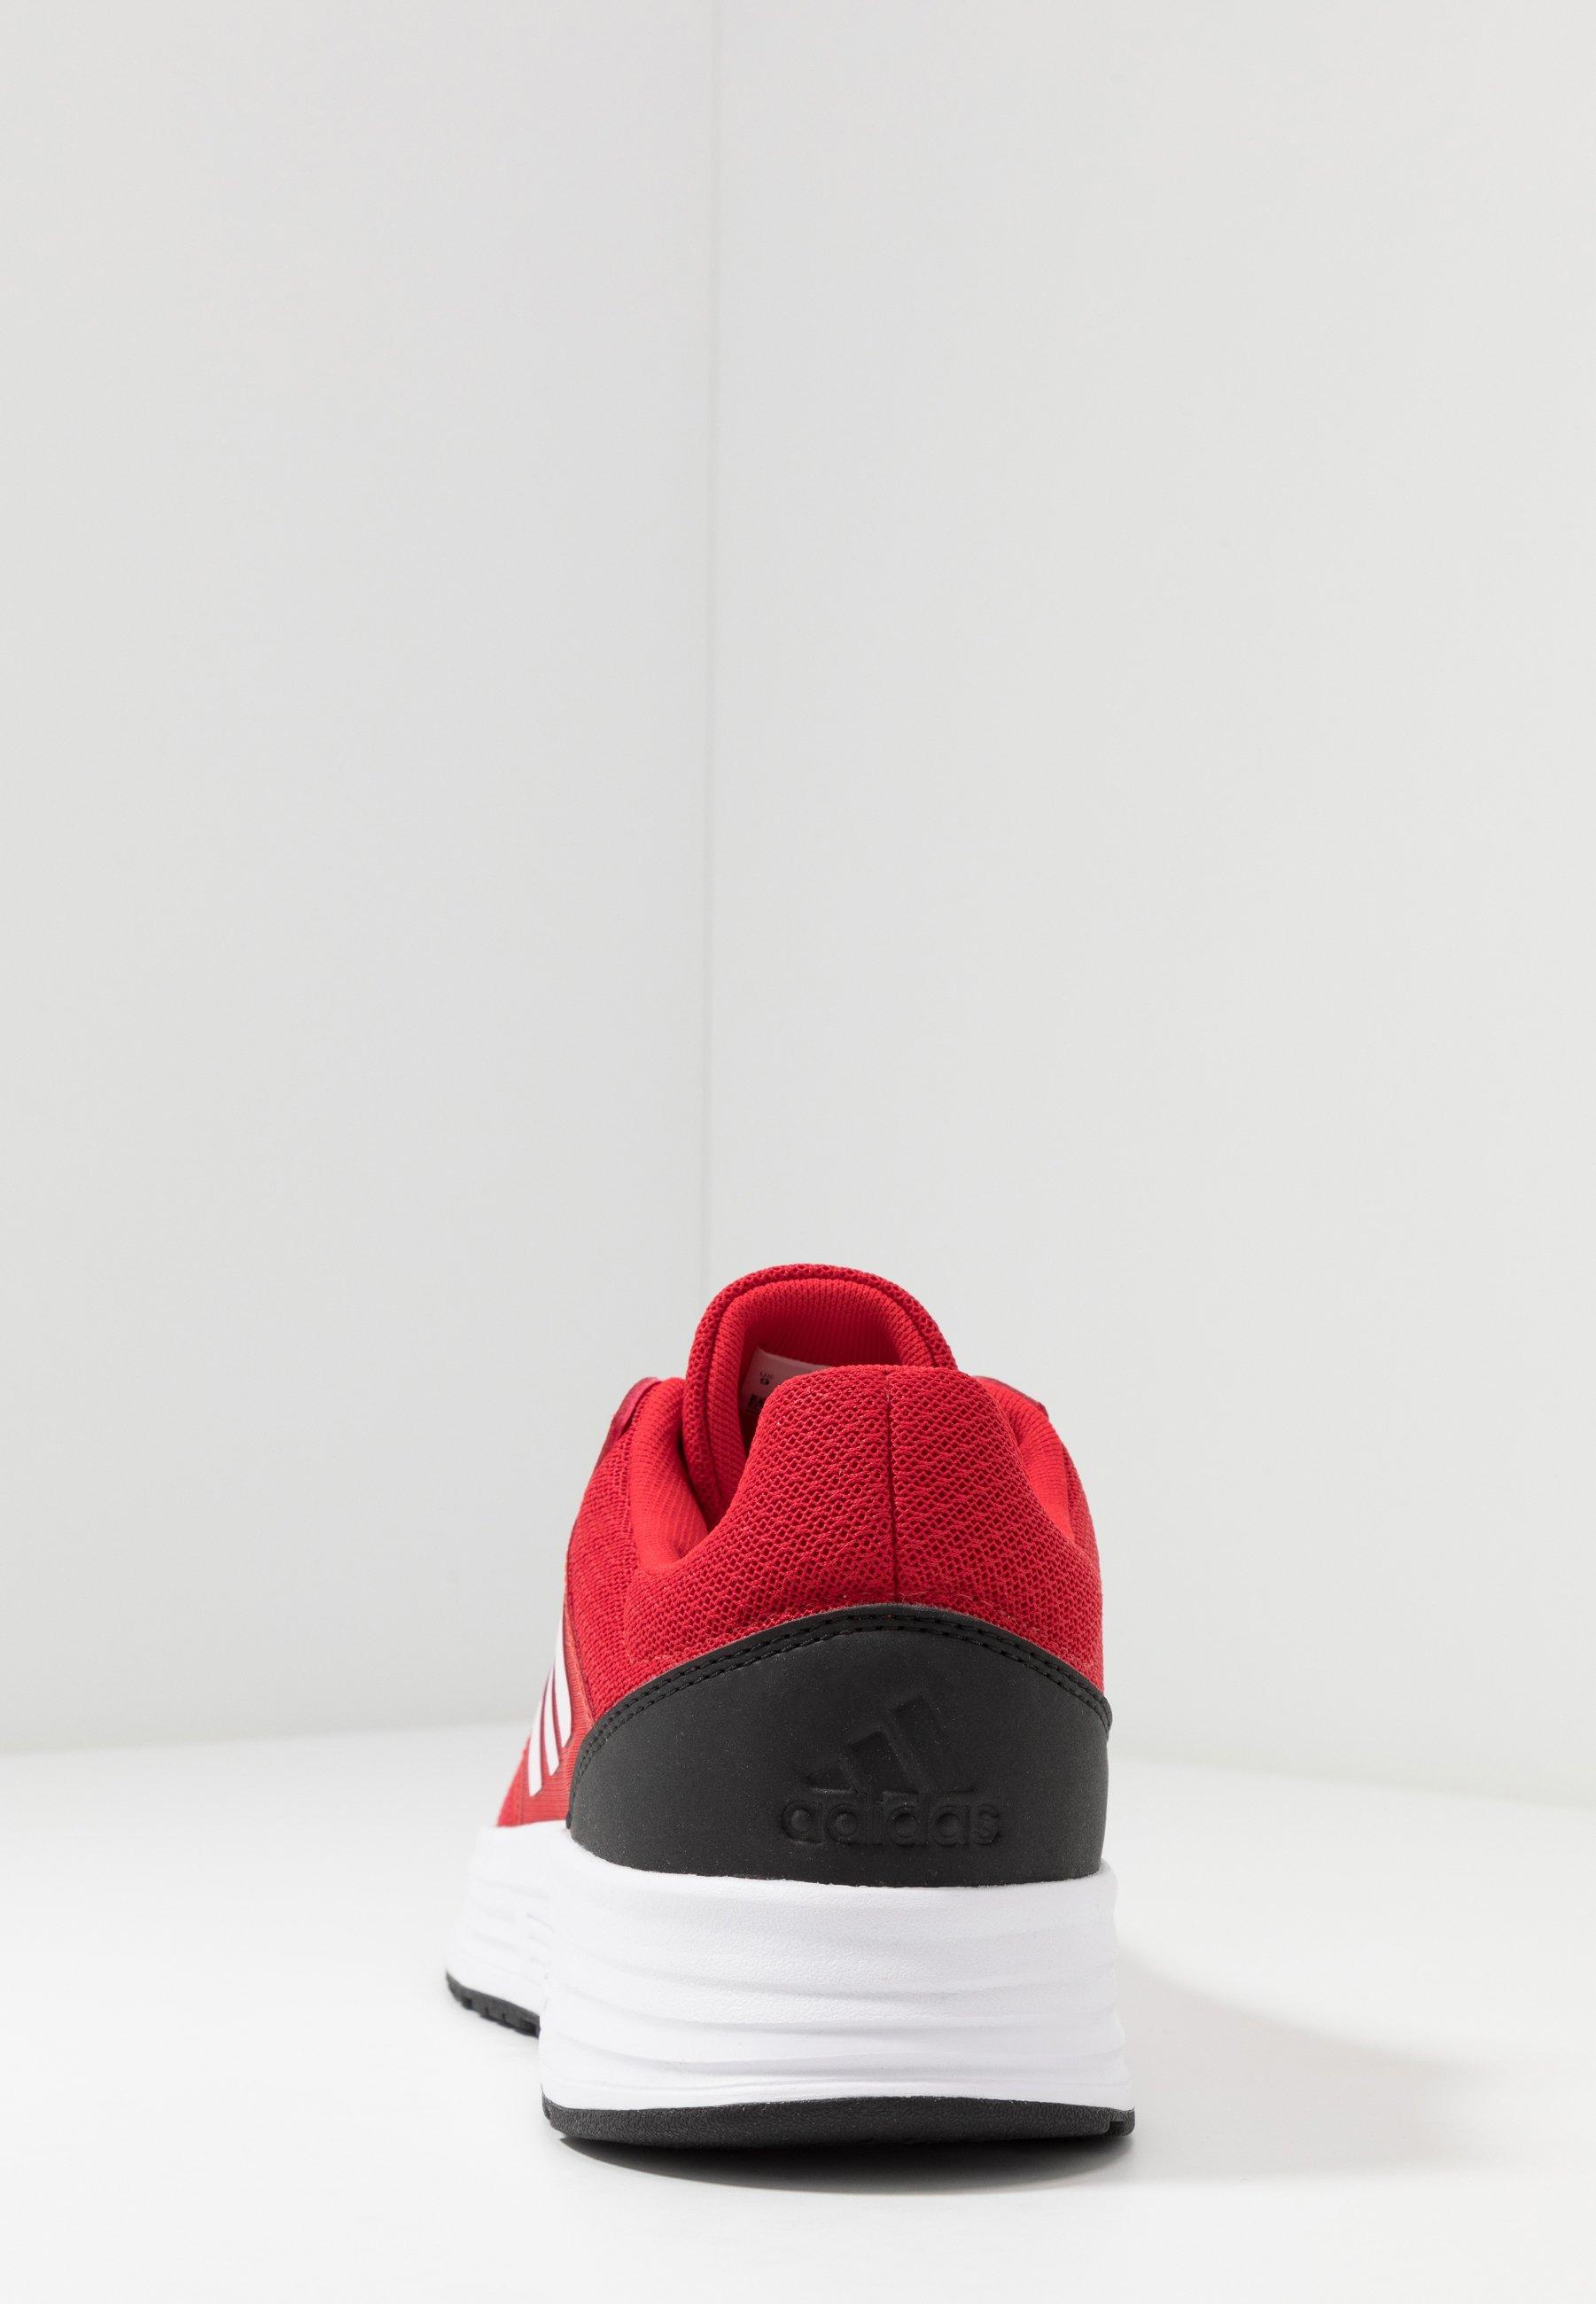 Adidas Performance Galaxy Classic Cloudfoam Sports Running Shoes - Scarpe Neutre Scarlet/footwear White/core Black Scontate